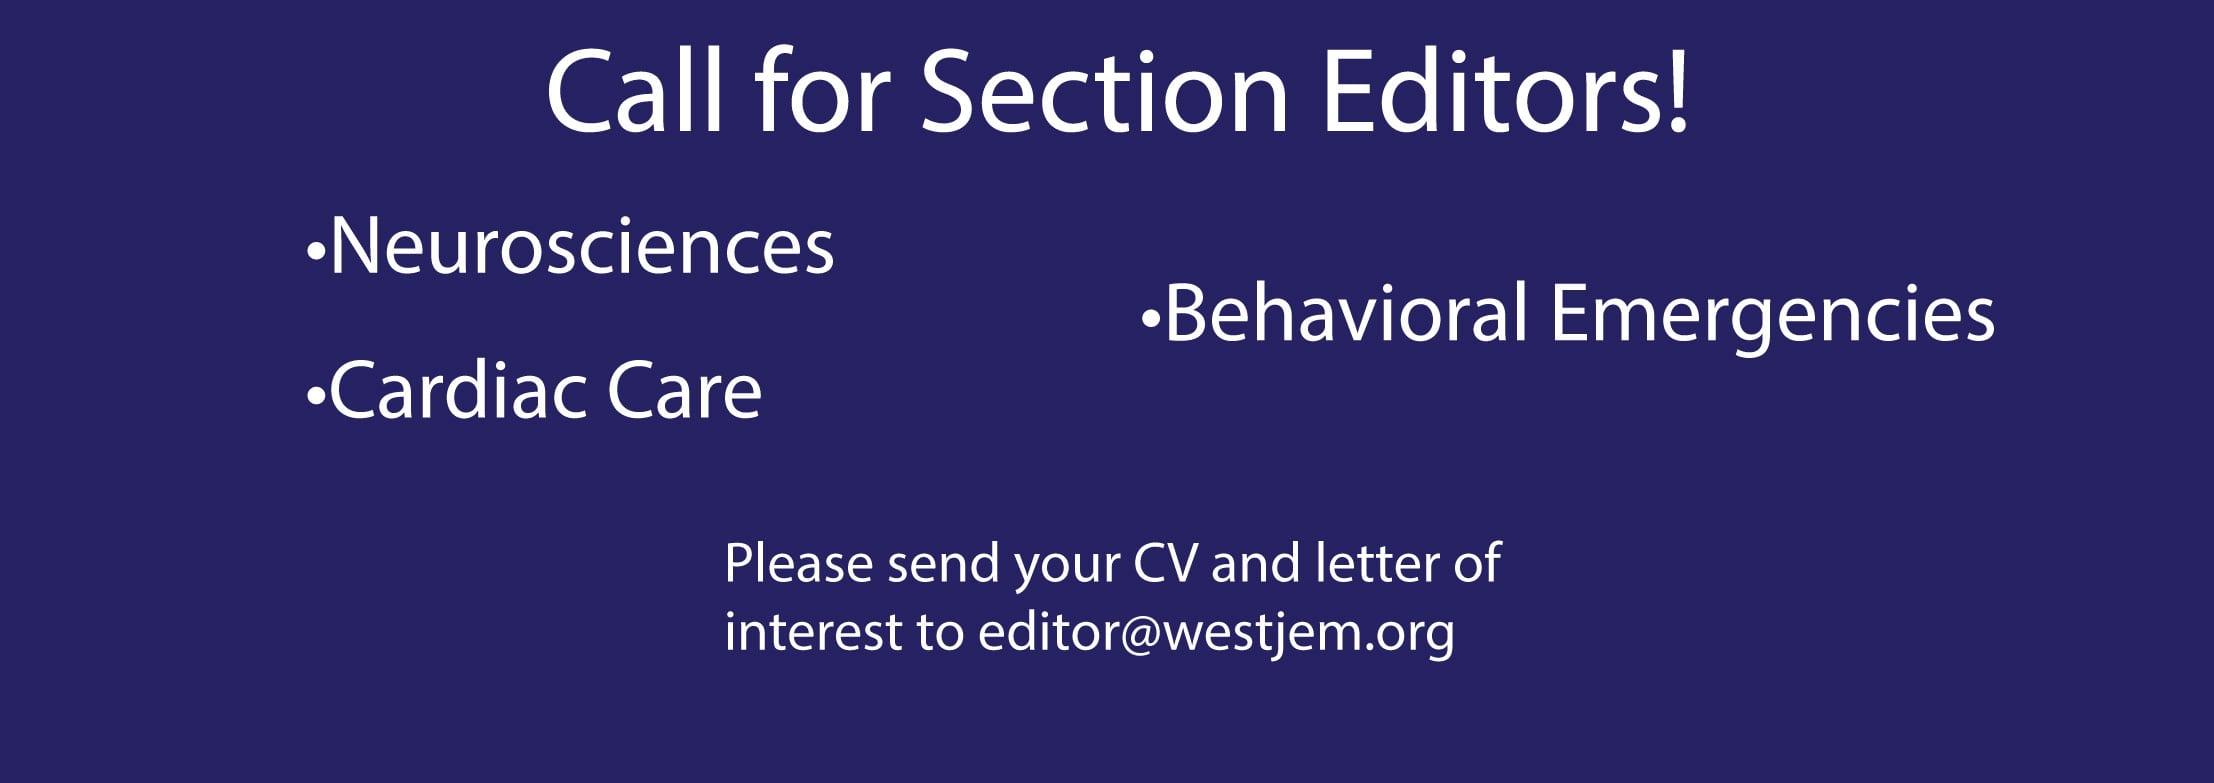 westjem-banner-section-editor-3-8